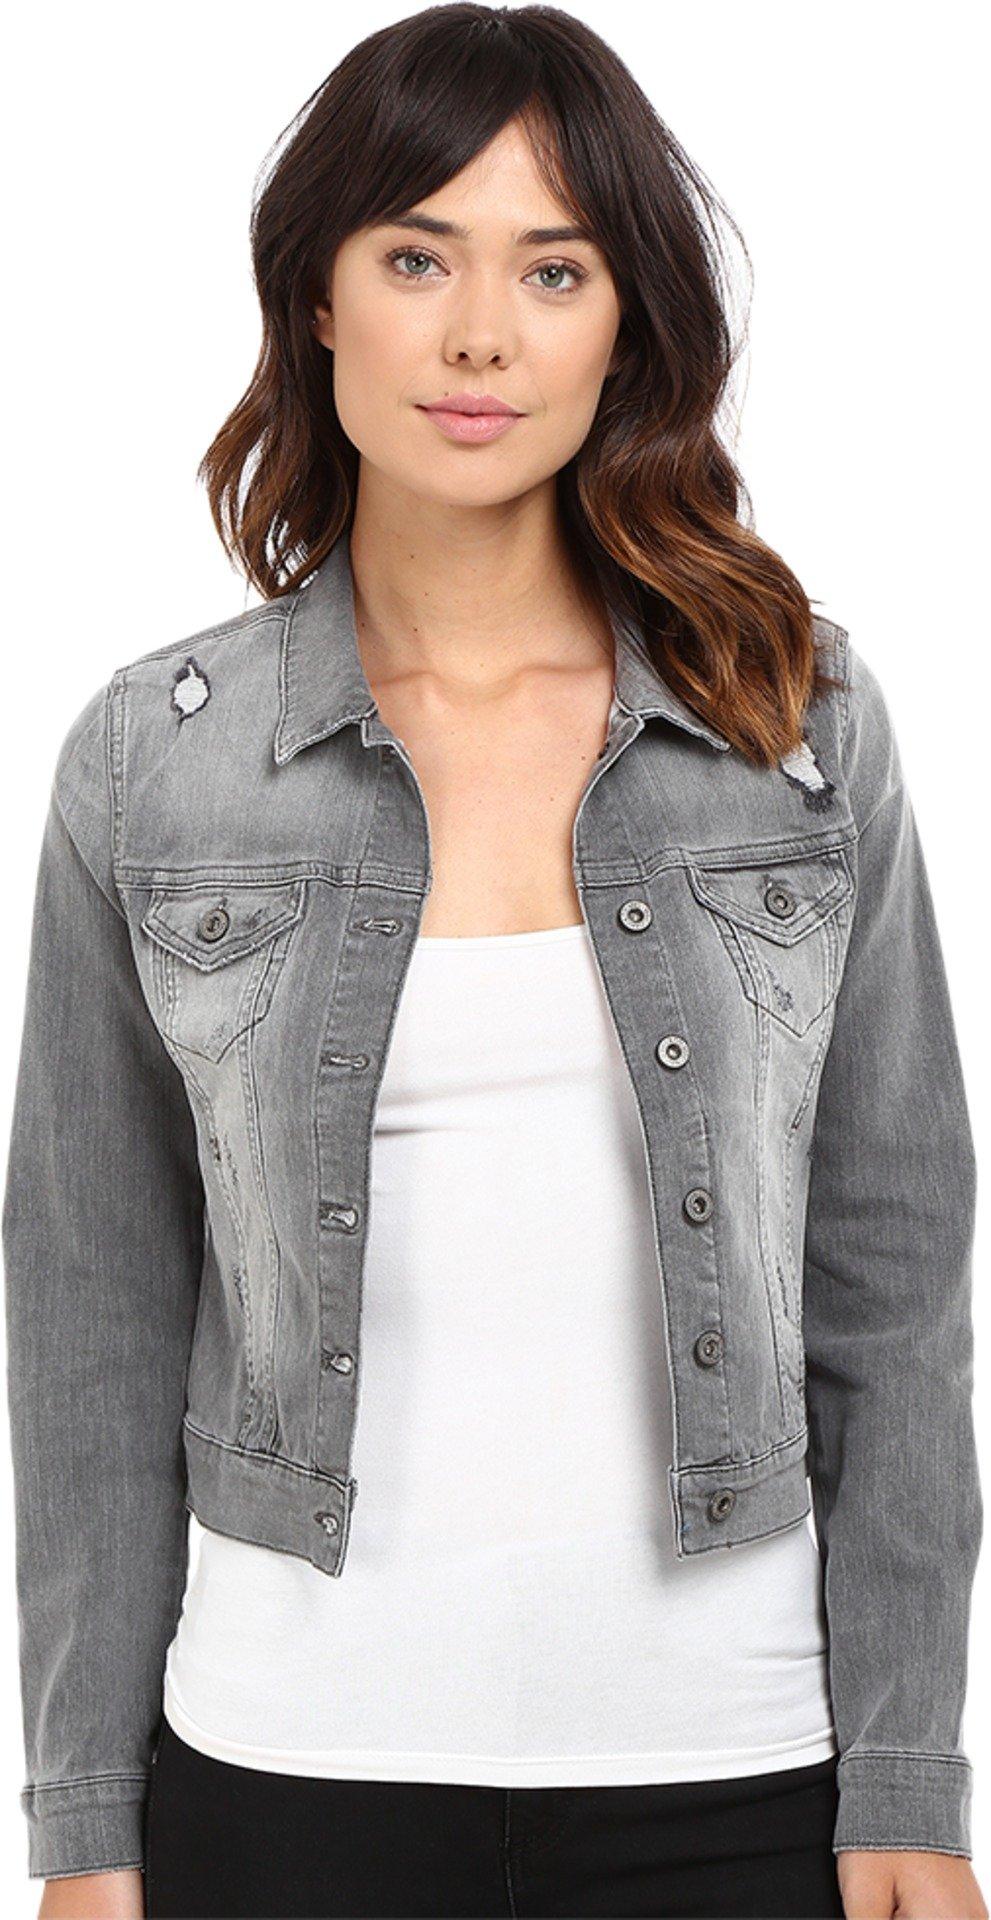 Mavi Jeans Women's Samantha Jacket Grey Vintage MD